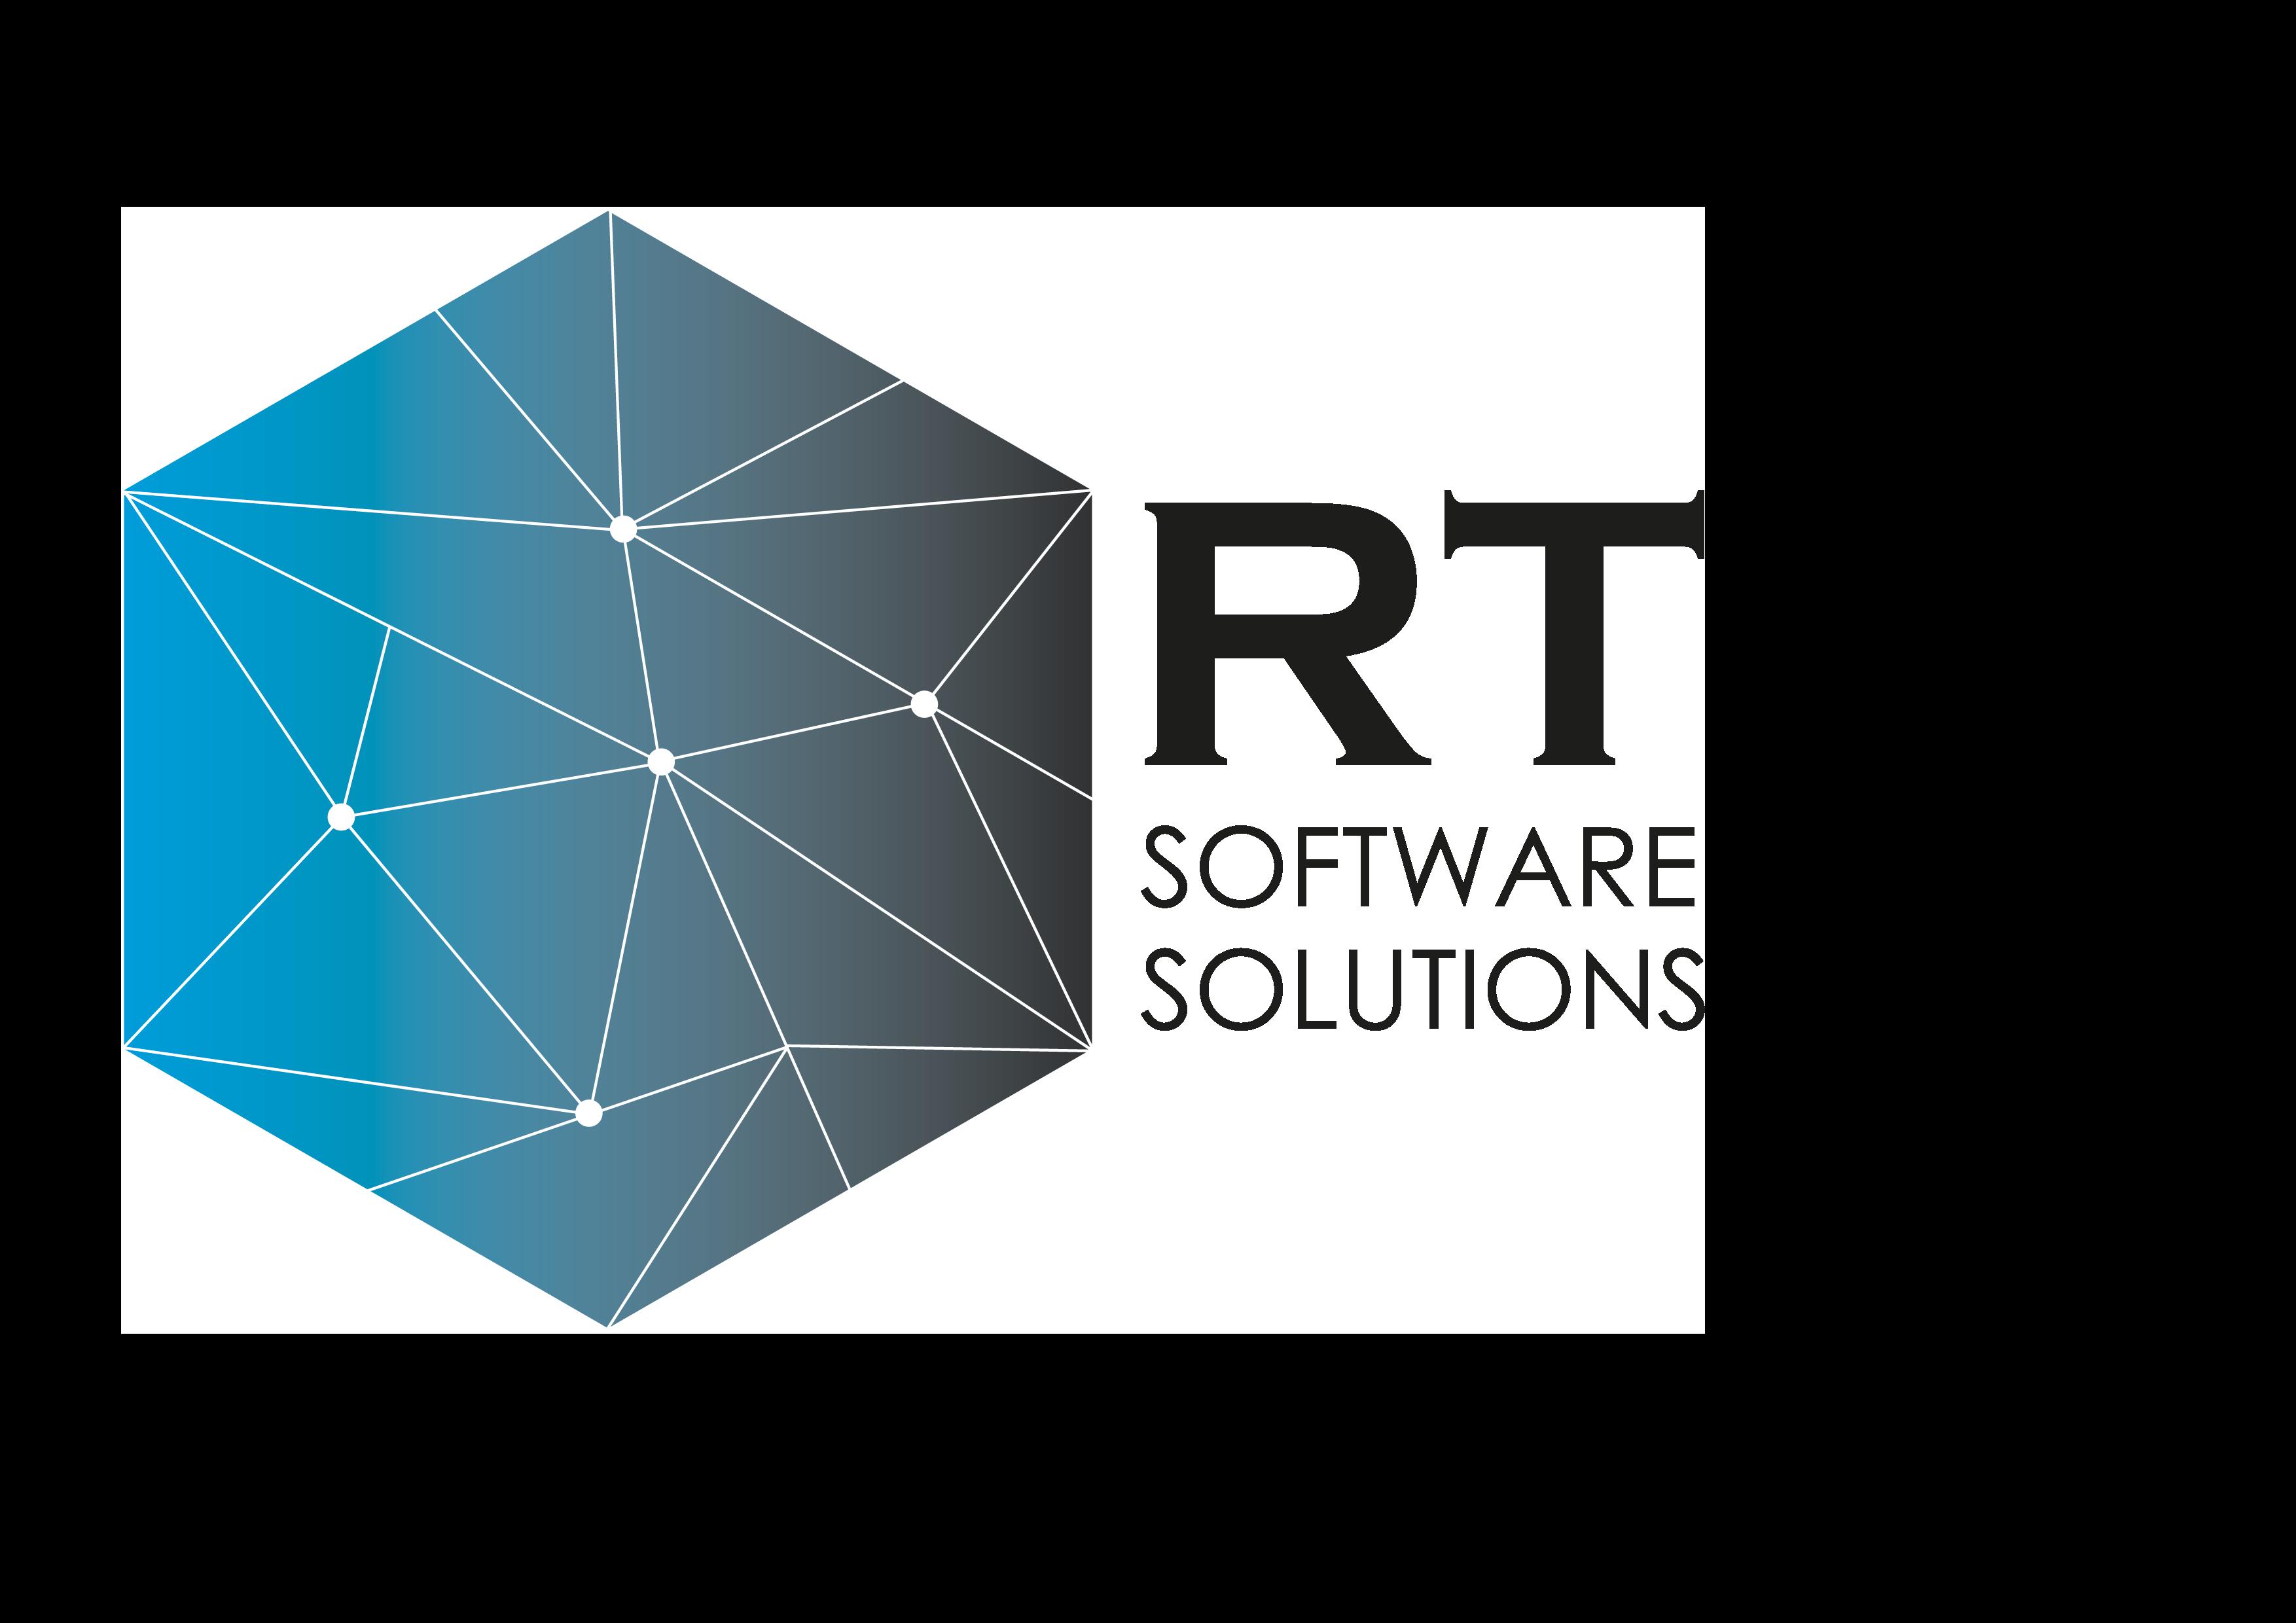 R&T Softwaresolutions GmbH